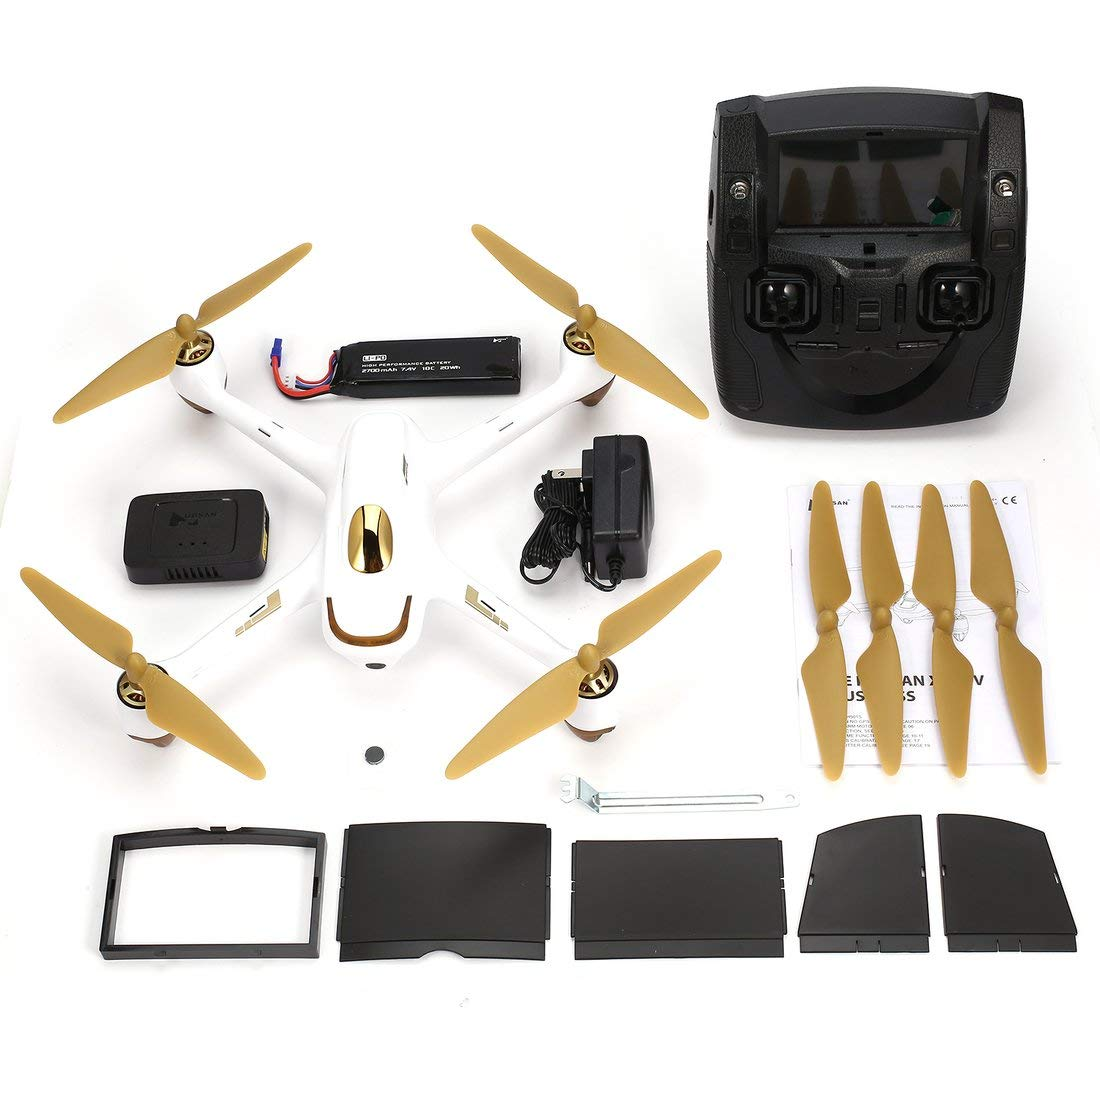 Formulaone Hubsan H501S 5.8G FPV Brushless 1080P Caacute;mara HD Drone Drone Drone Altitude Hold Retorno automaacute;tico Modo sin Cabeza RC Quadcopter con GPS 9b876e